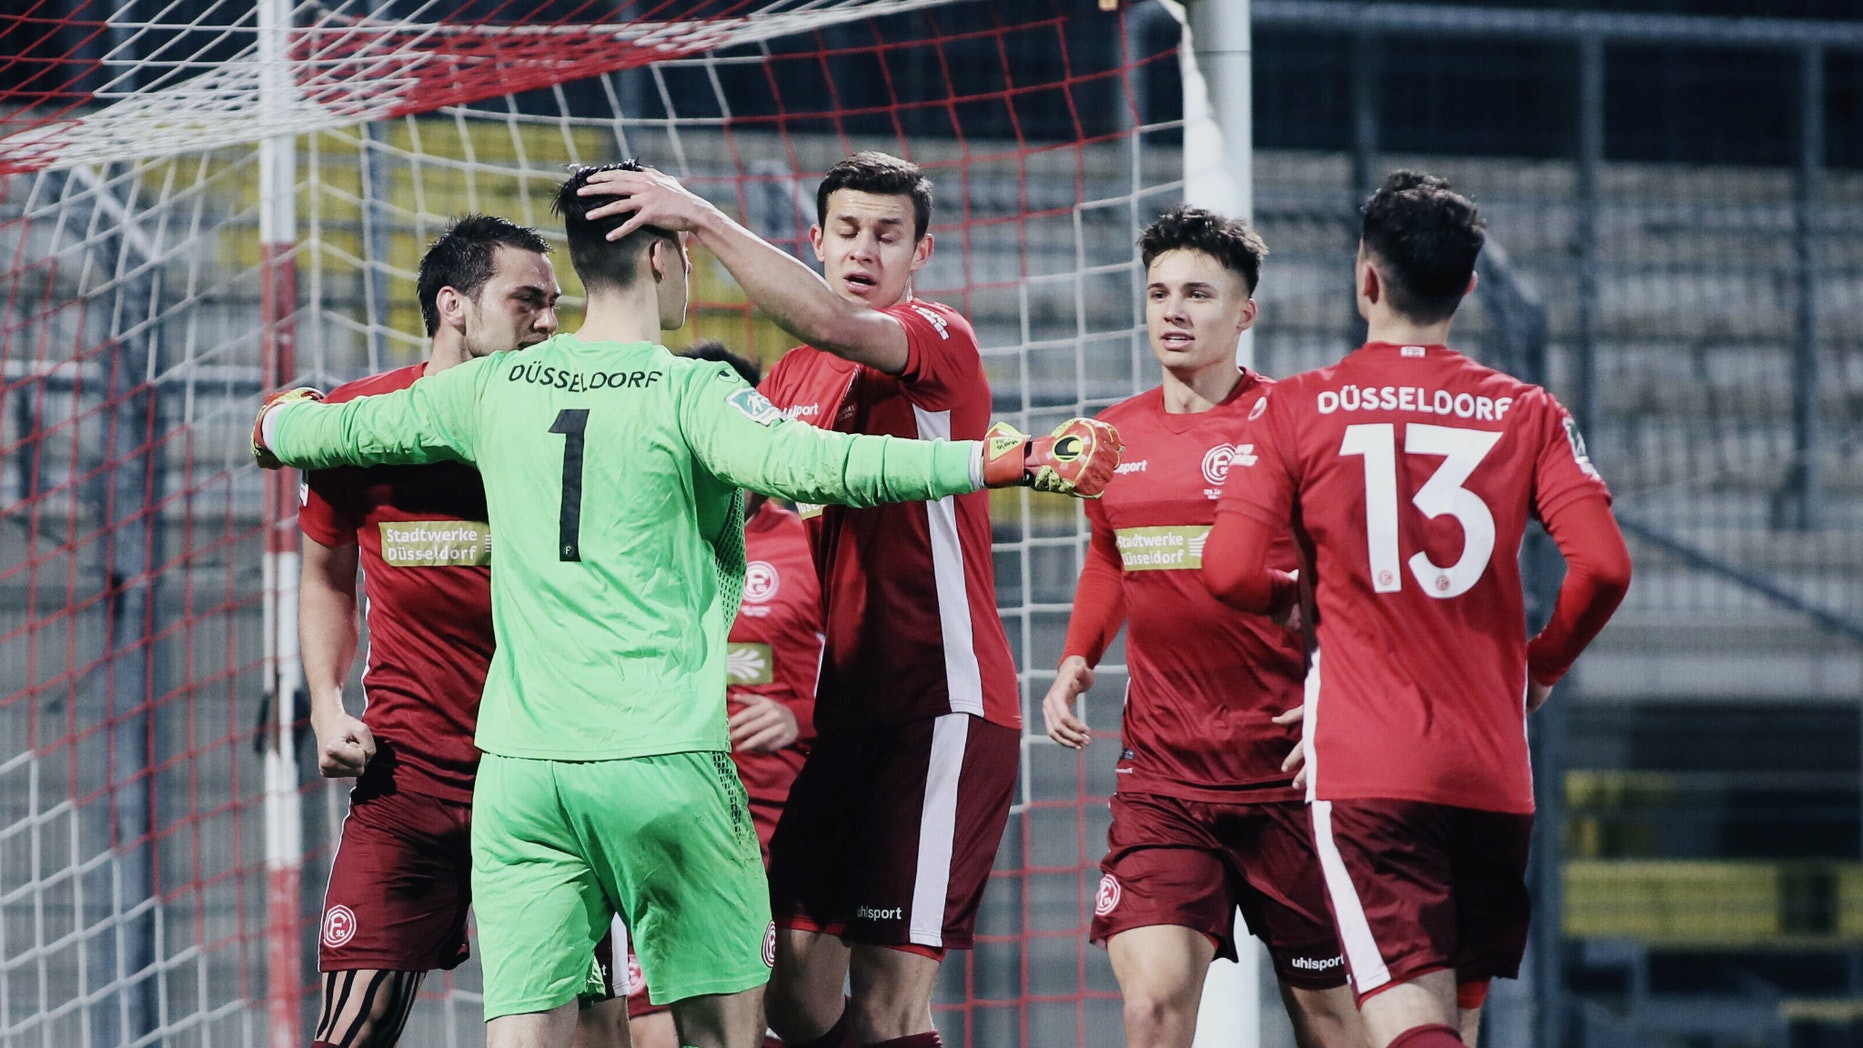 27.03.2021, 14:00 Uhr: Fortuna Düsseldorf U23 vs. Borussia Dortmund U23